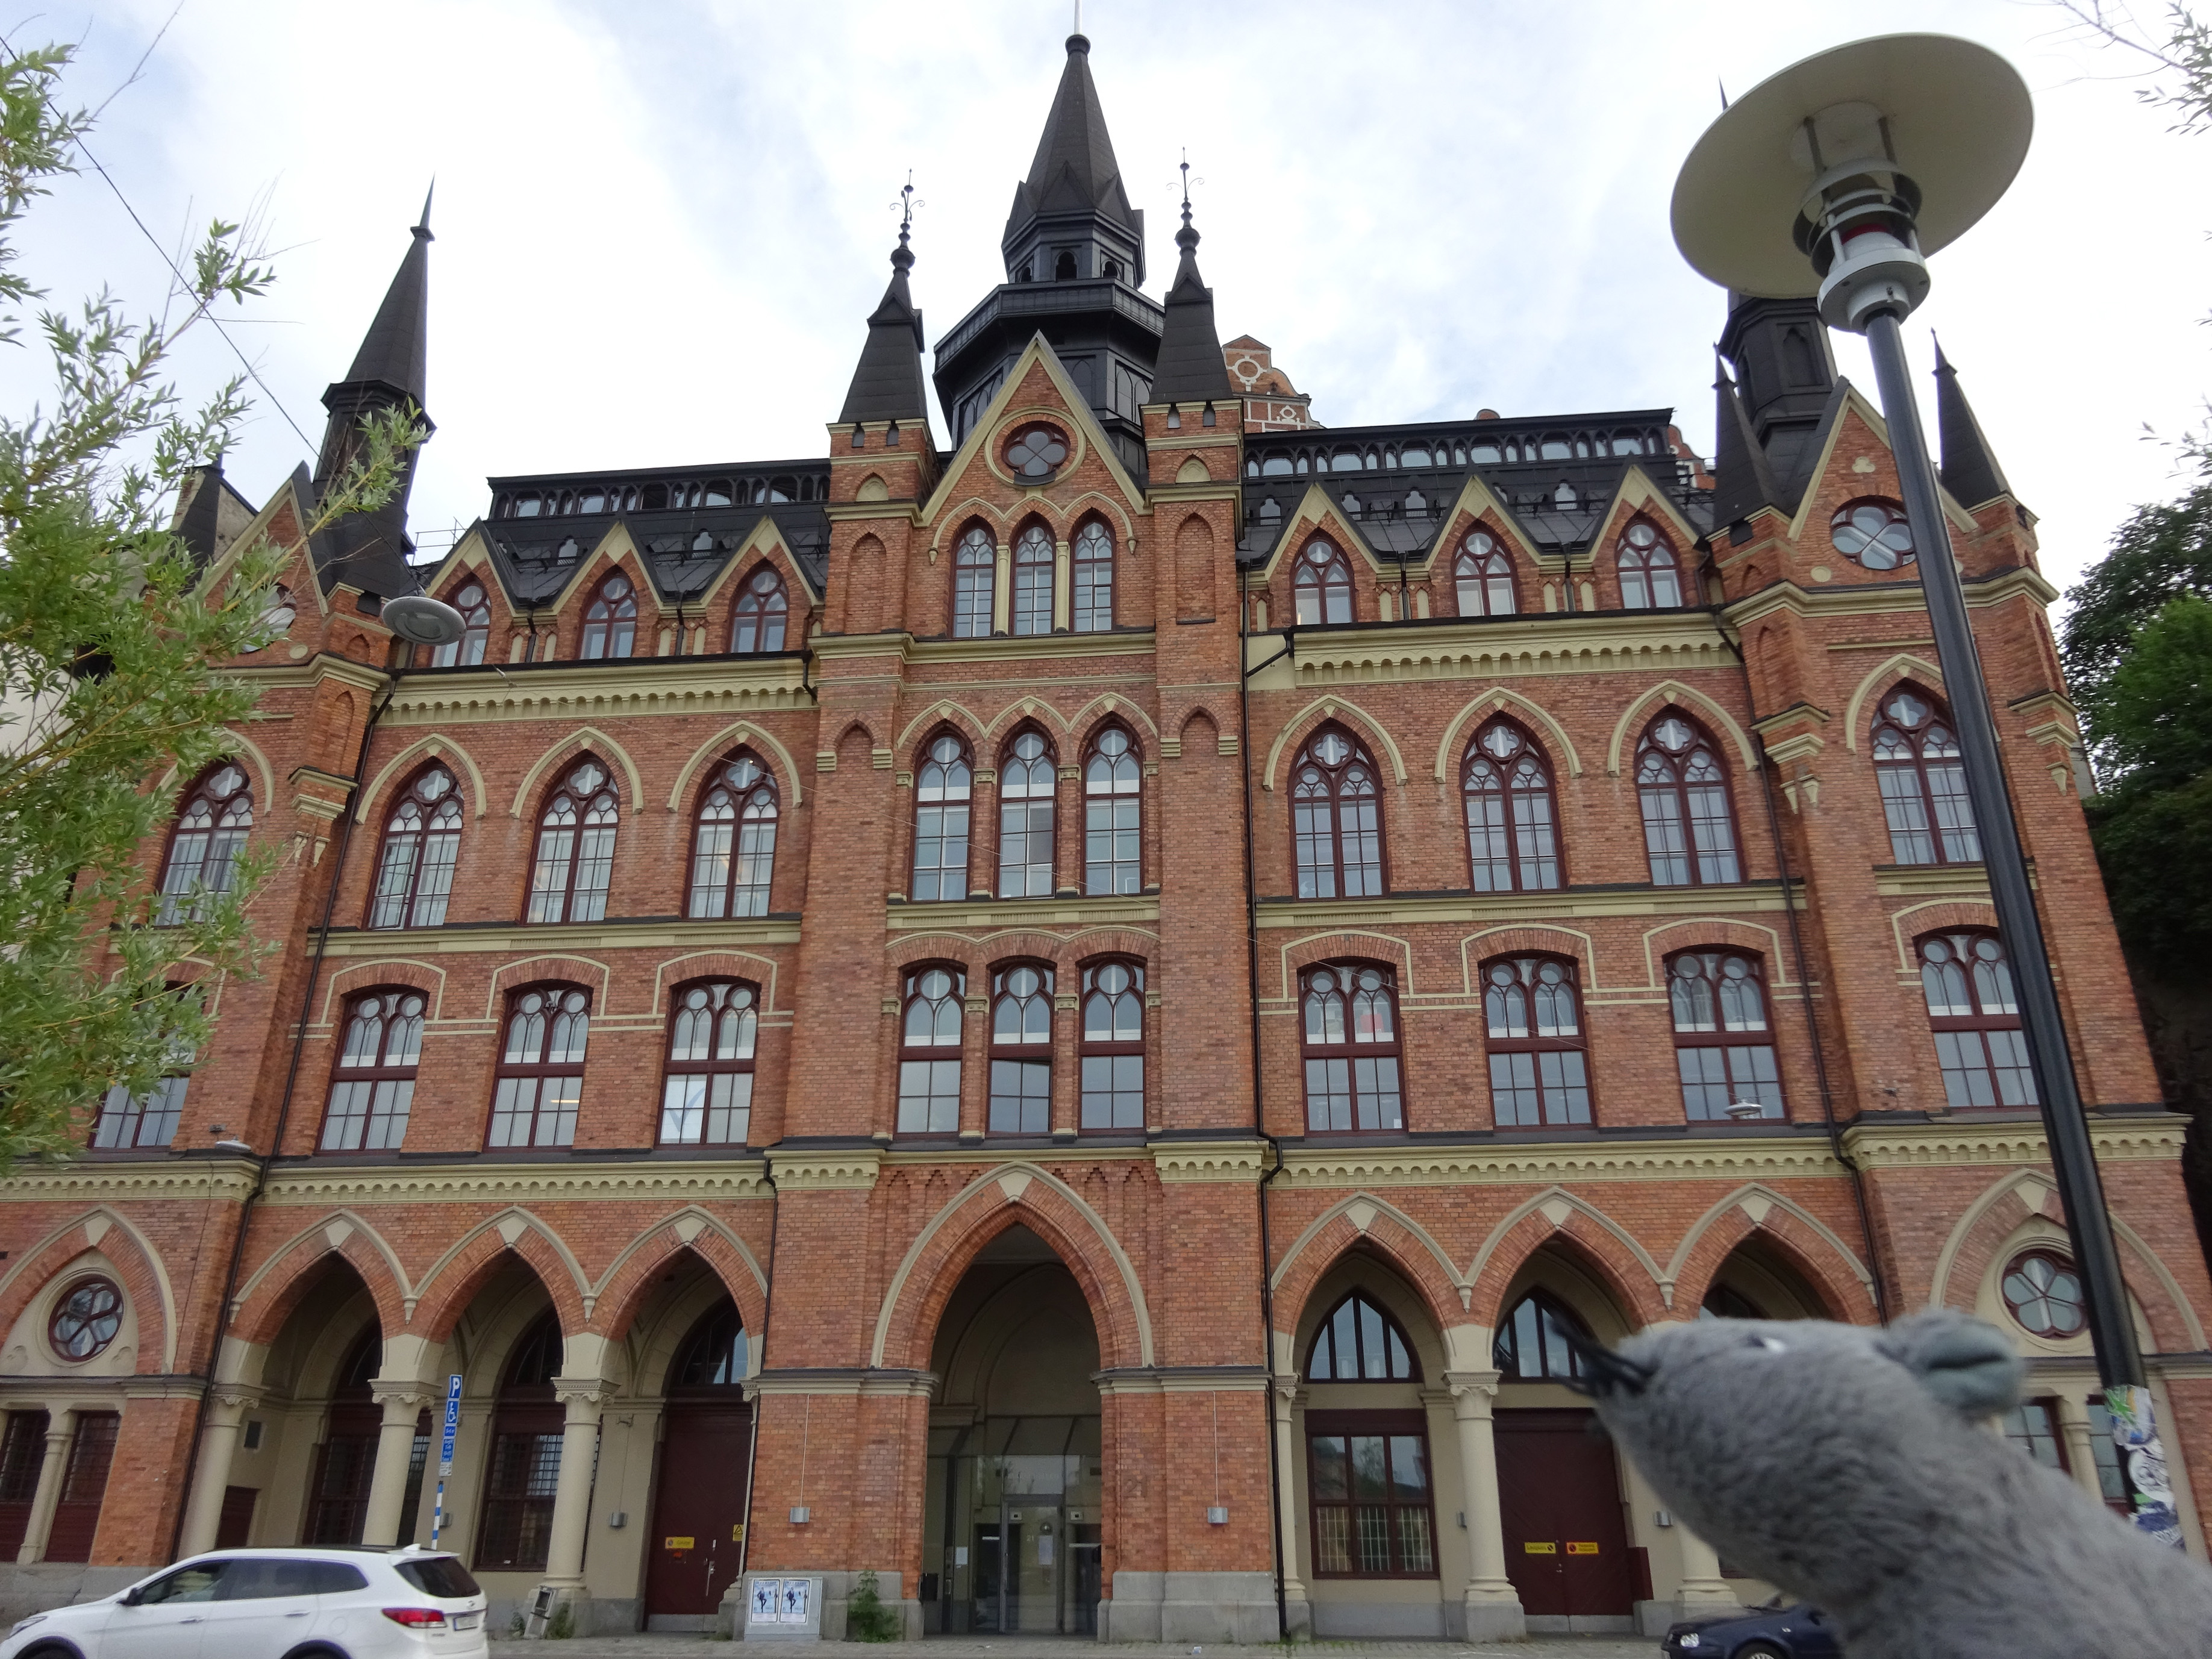 blog_d14s04_stockholm_001.jpg